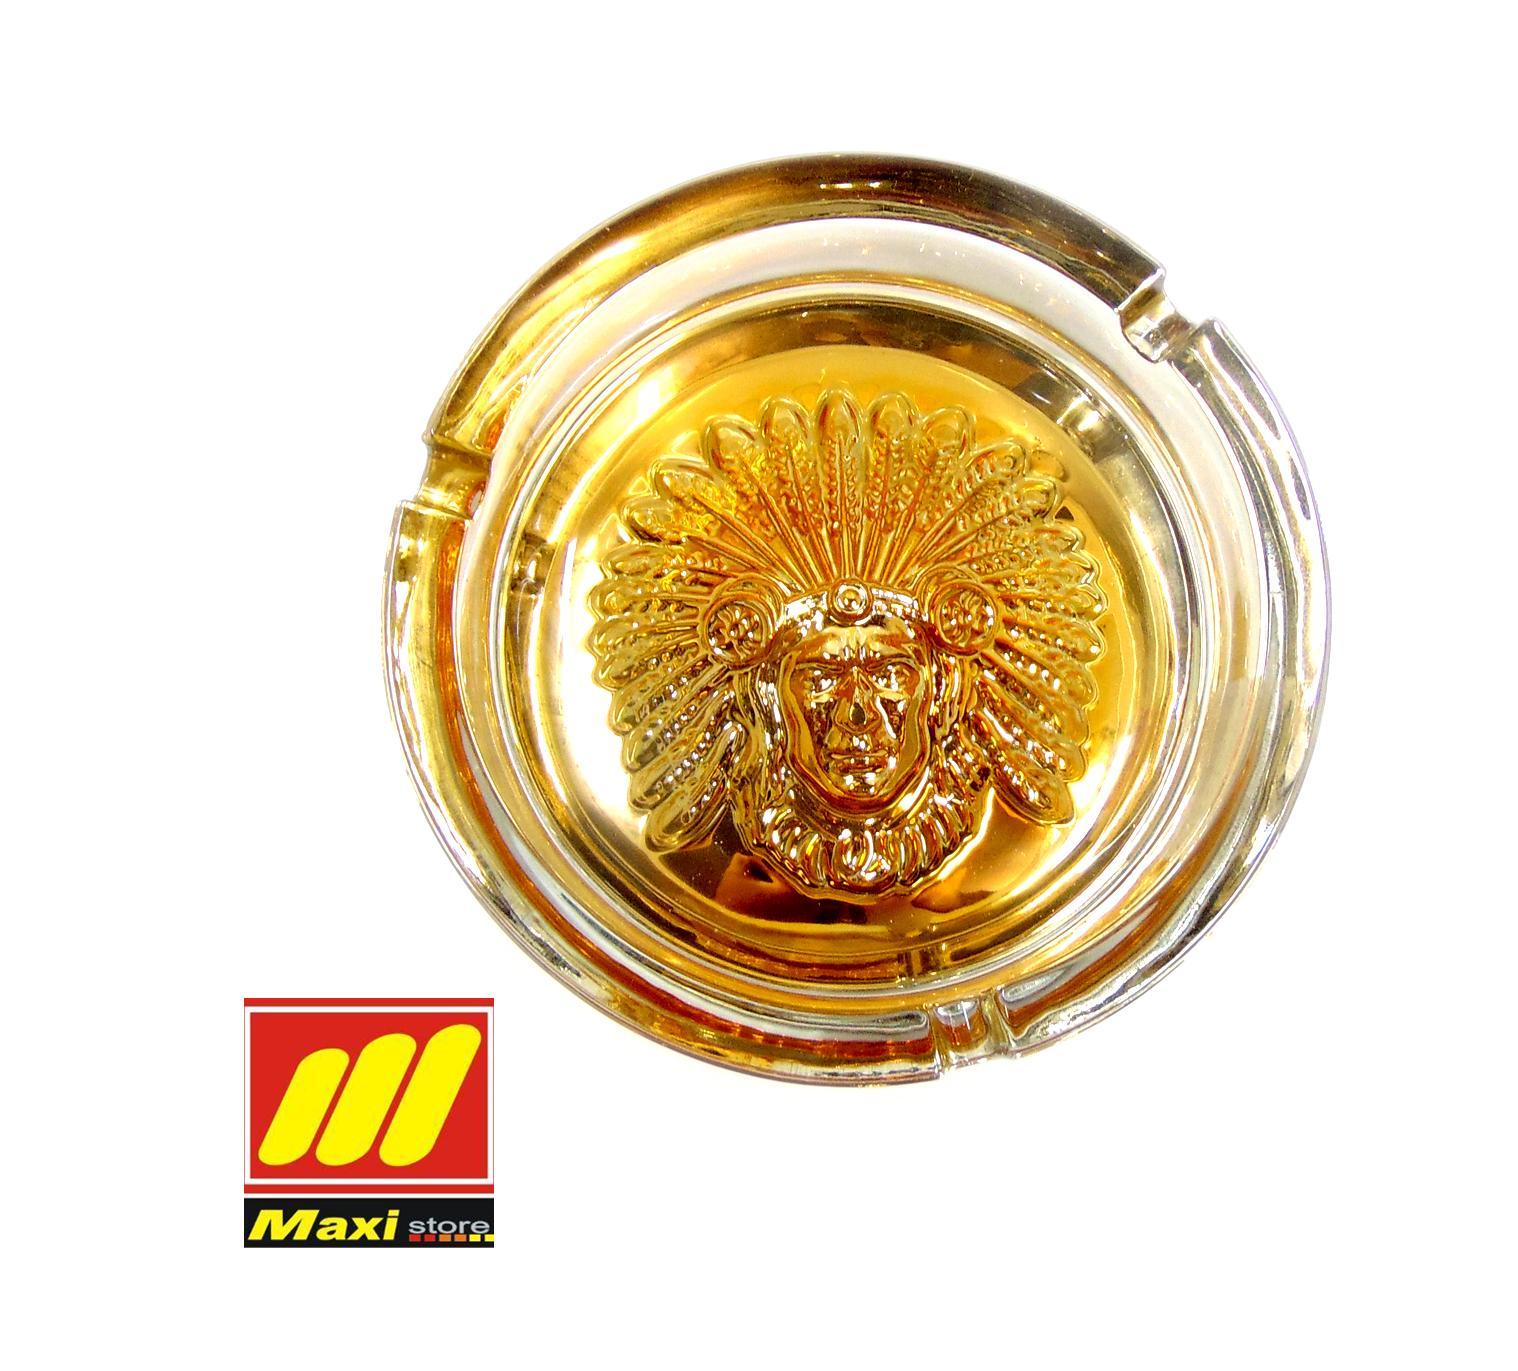 Rp 60.000 asbak bulat warna gold / Asbak kaca/ asbak rokok/asbak inchan - MaxistoreIDR60000. Rp 61.000